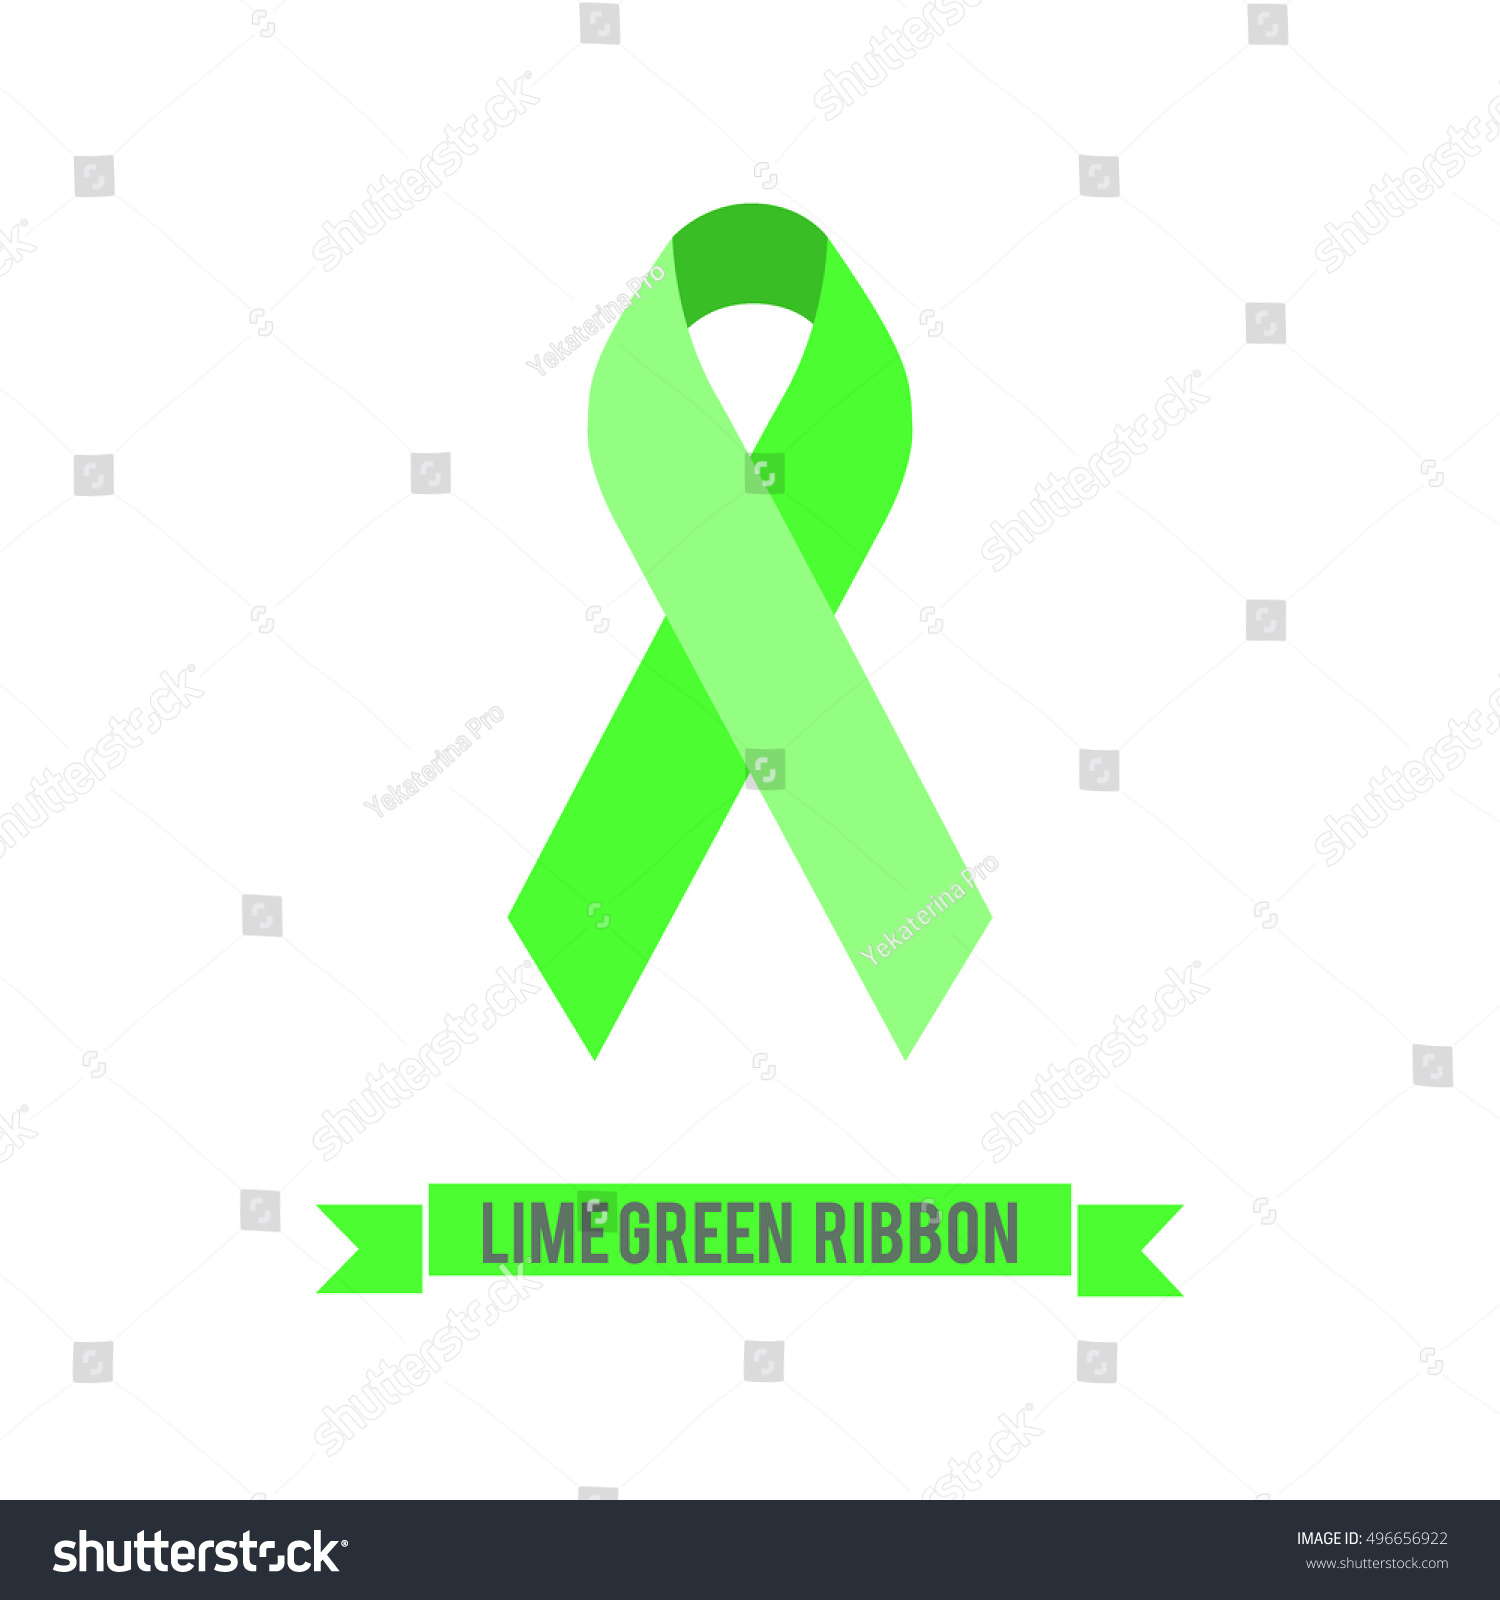 Lime Green Ribbon Symbol Achalasia Awareness Stock Vector Royalty